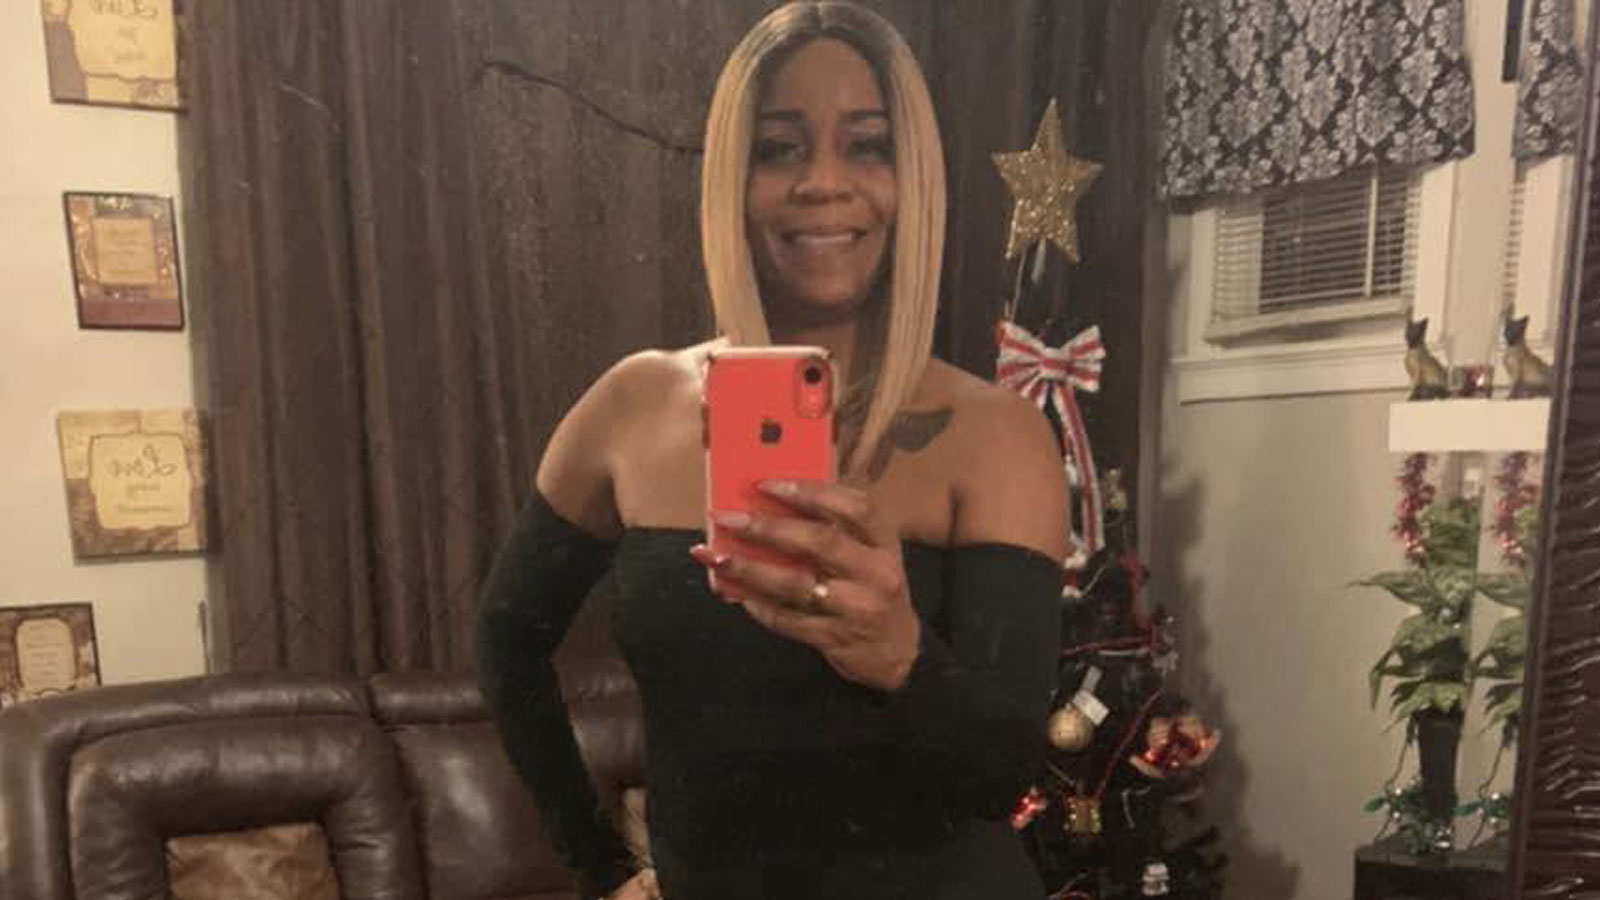 HRC Mourns Riah Milton, Black Trans Woman Killed in Ohio | Human ...